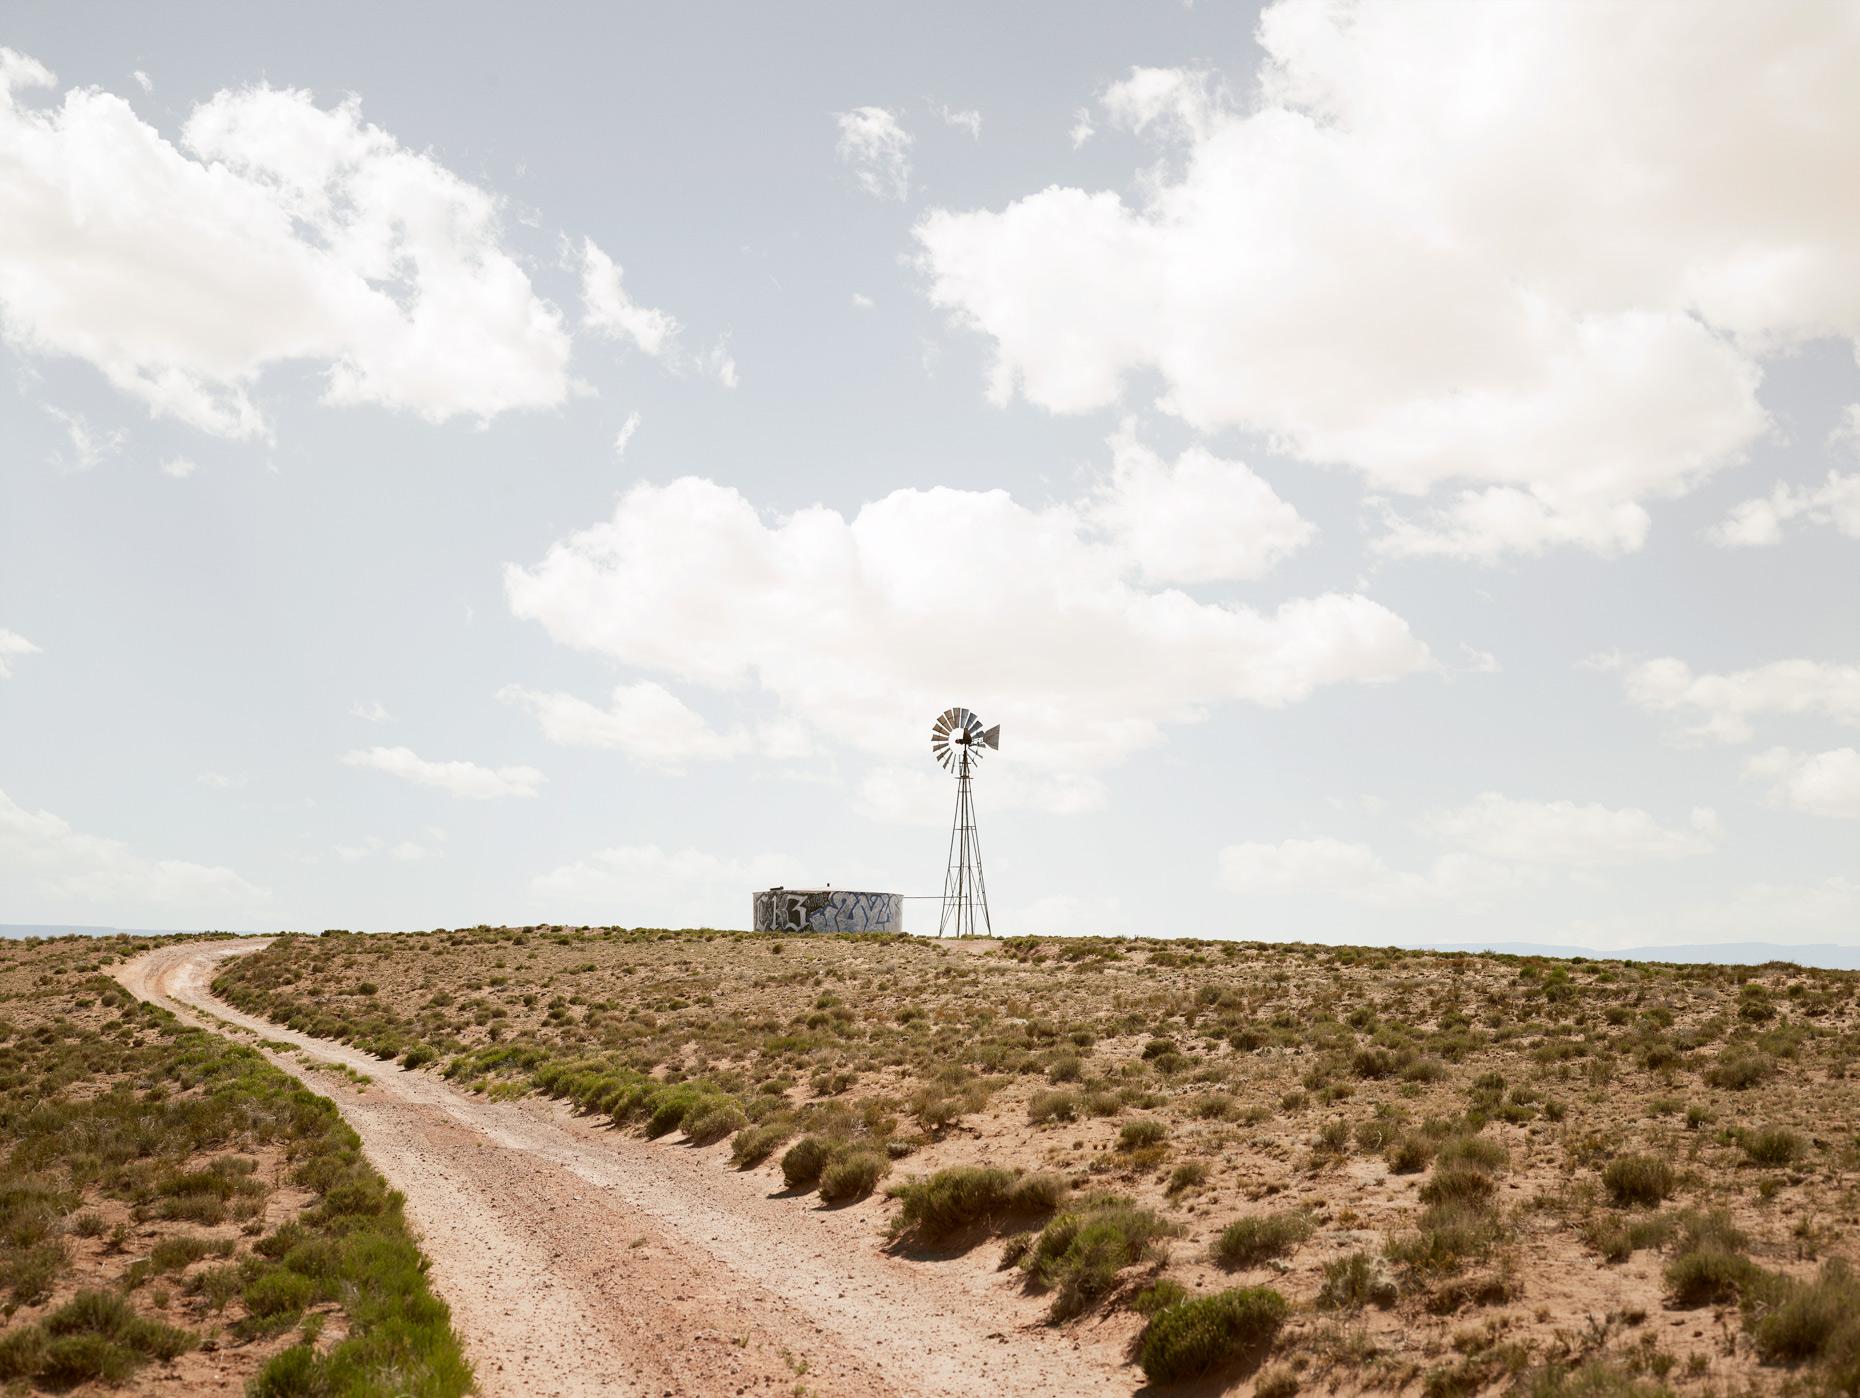 Projects_Travel_Photography_Derek_Israelsen_049_Roadtrip_Home_Windmill.jpg